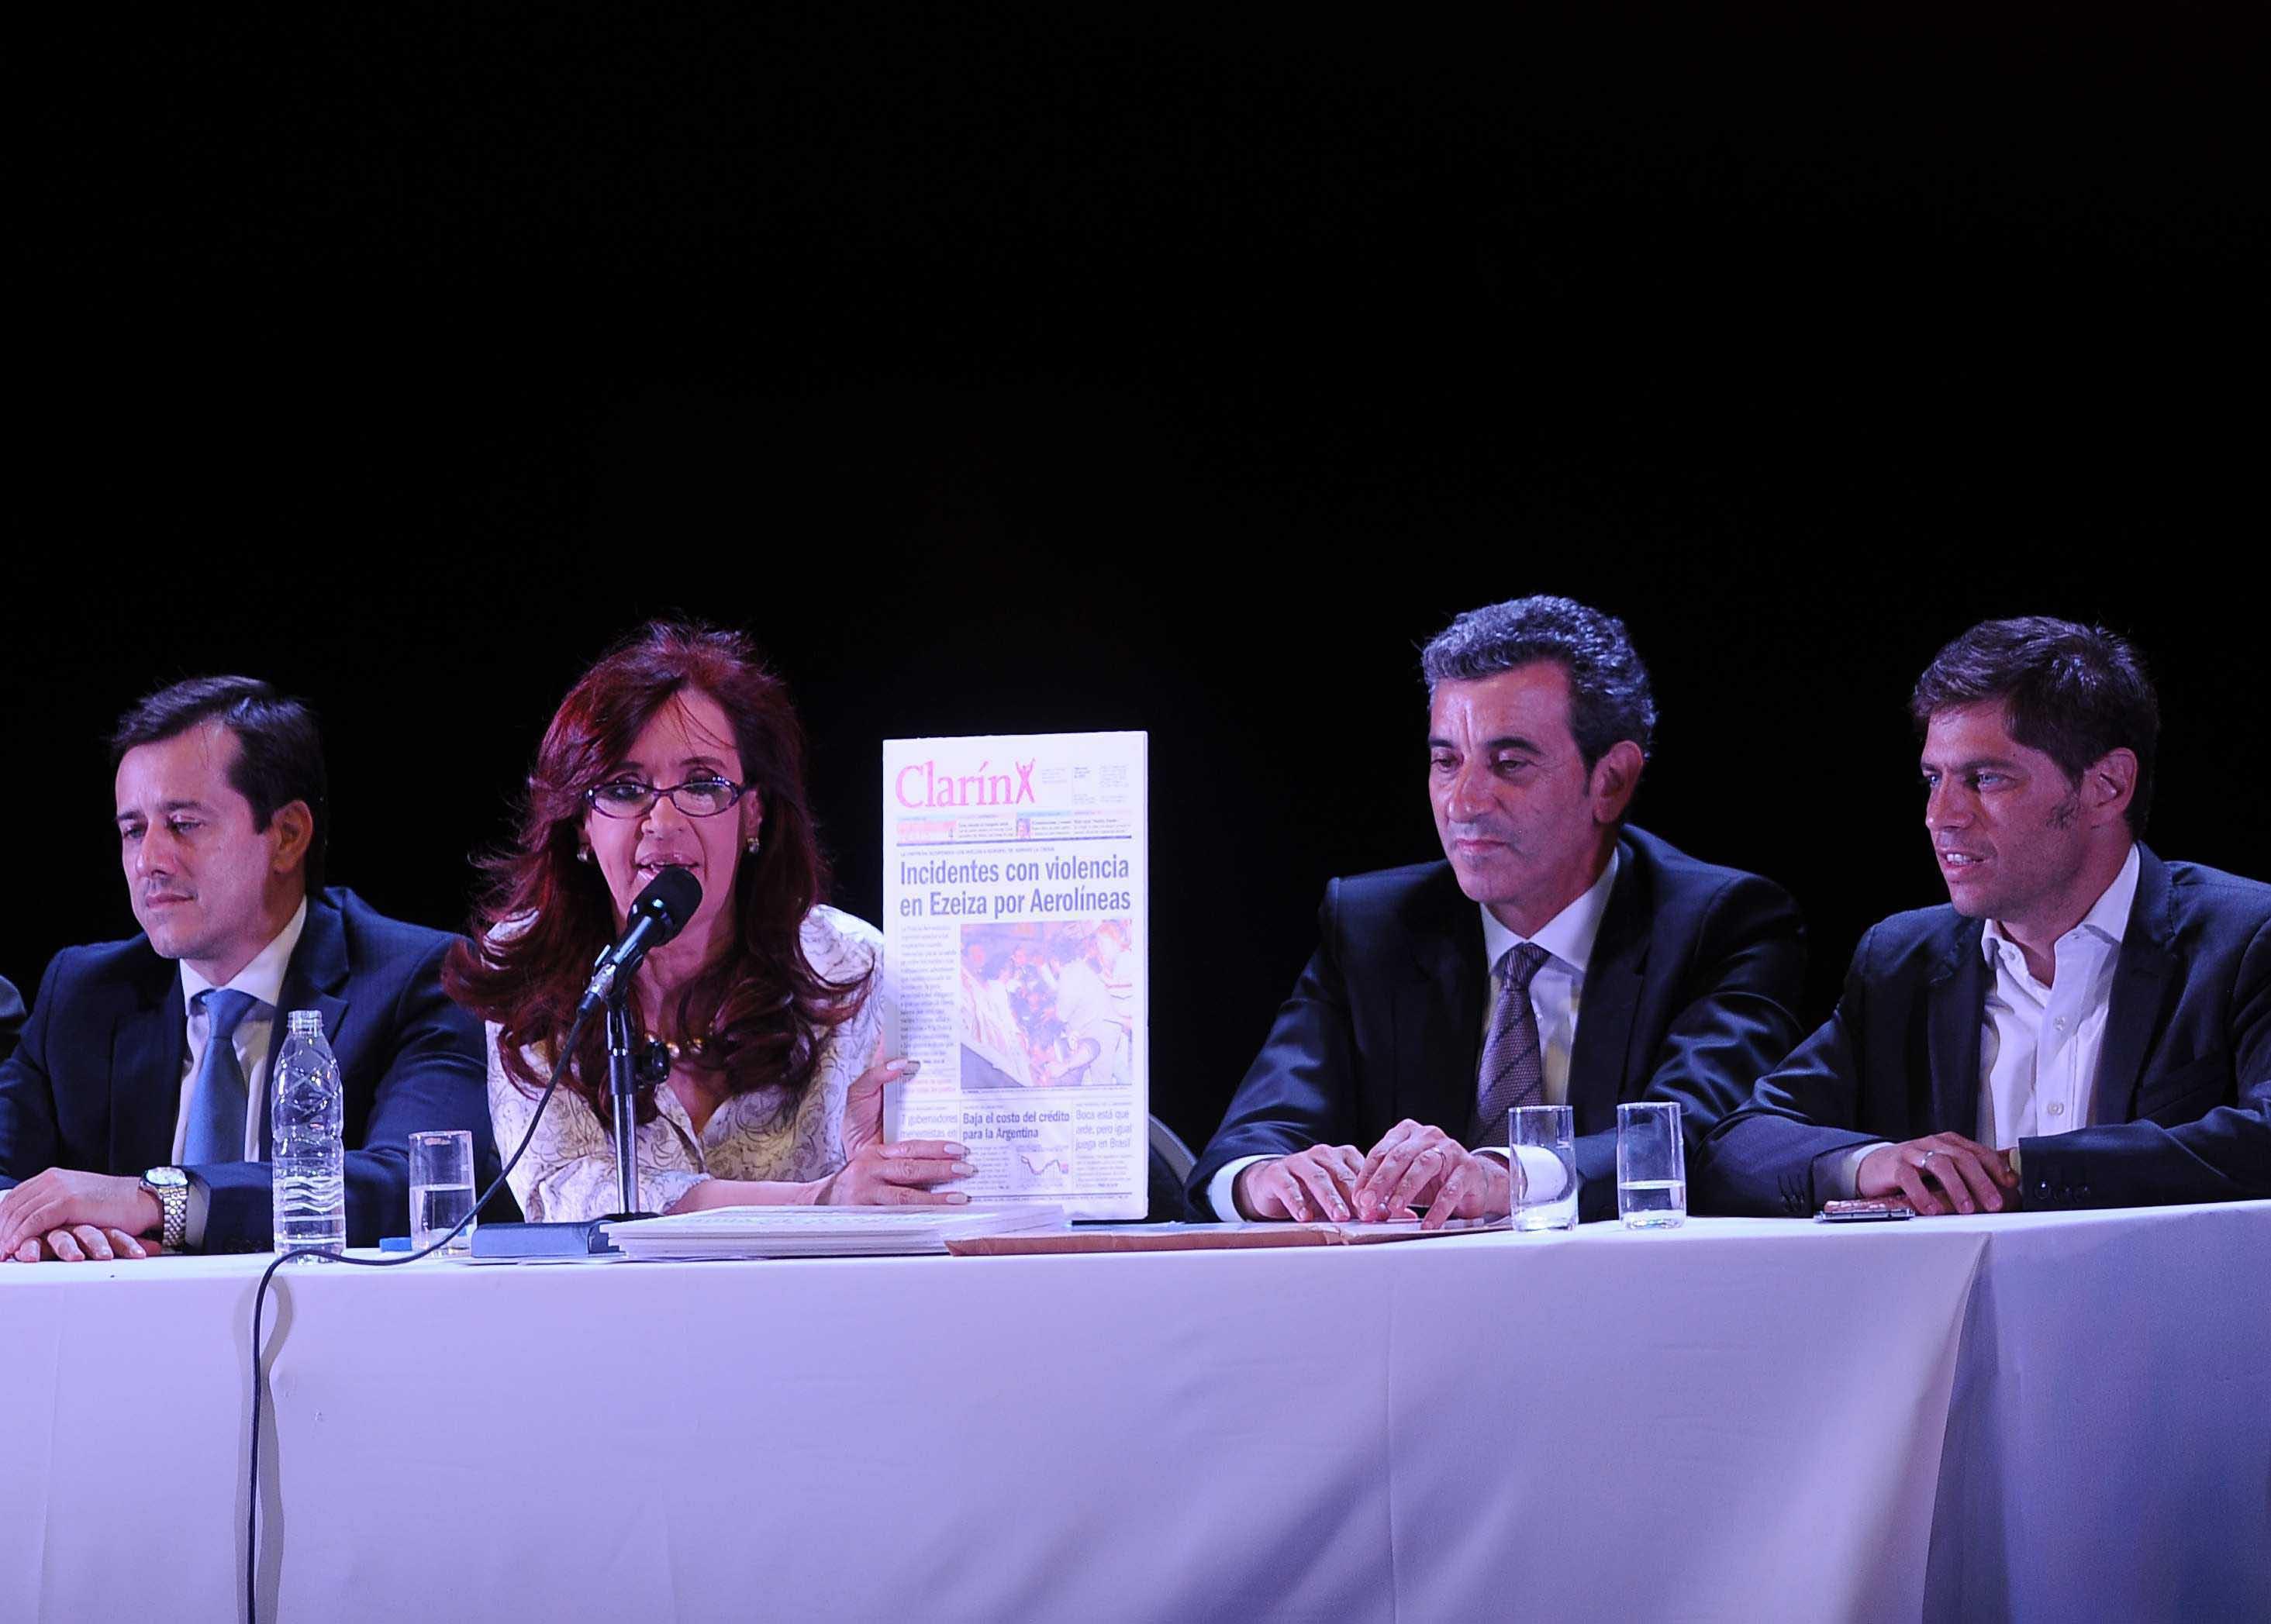 11-03-2015_buenos_aires_la_presidenta_cristina (4)